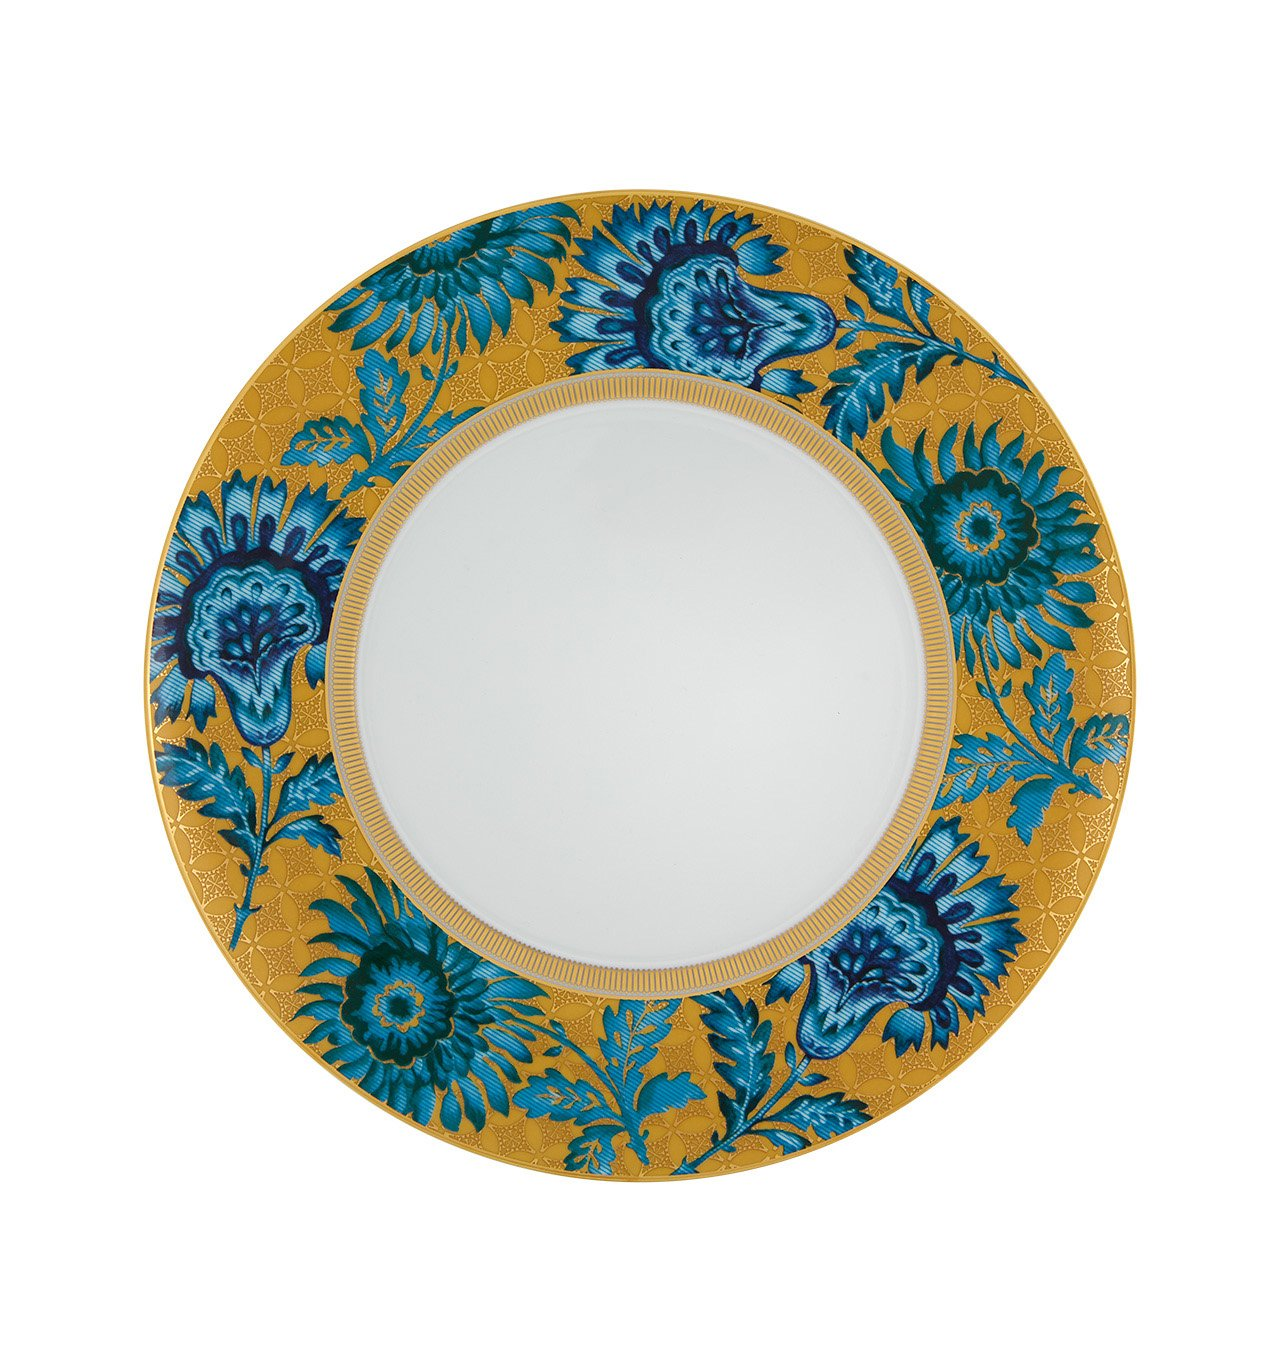 Vista Alegre Porcelain Gold Exotic Charger Plate